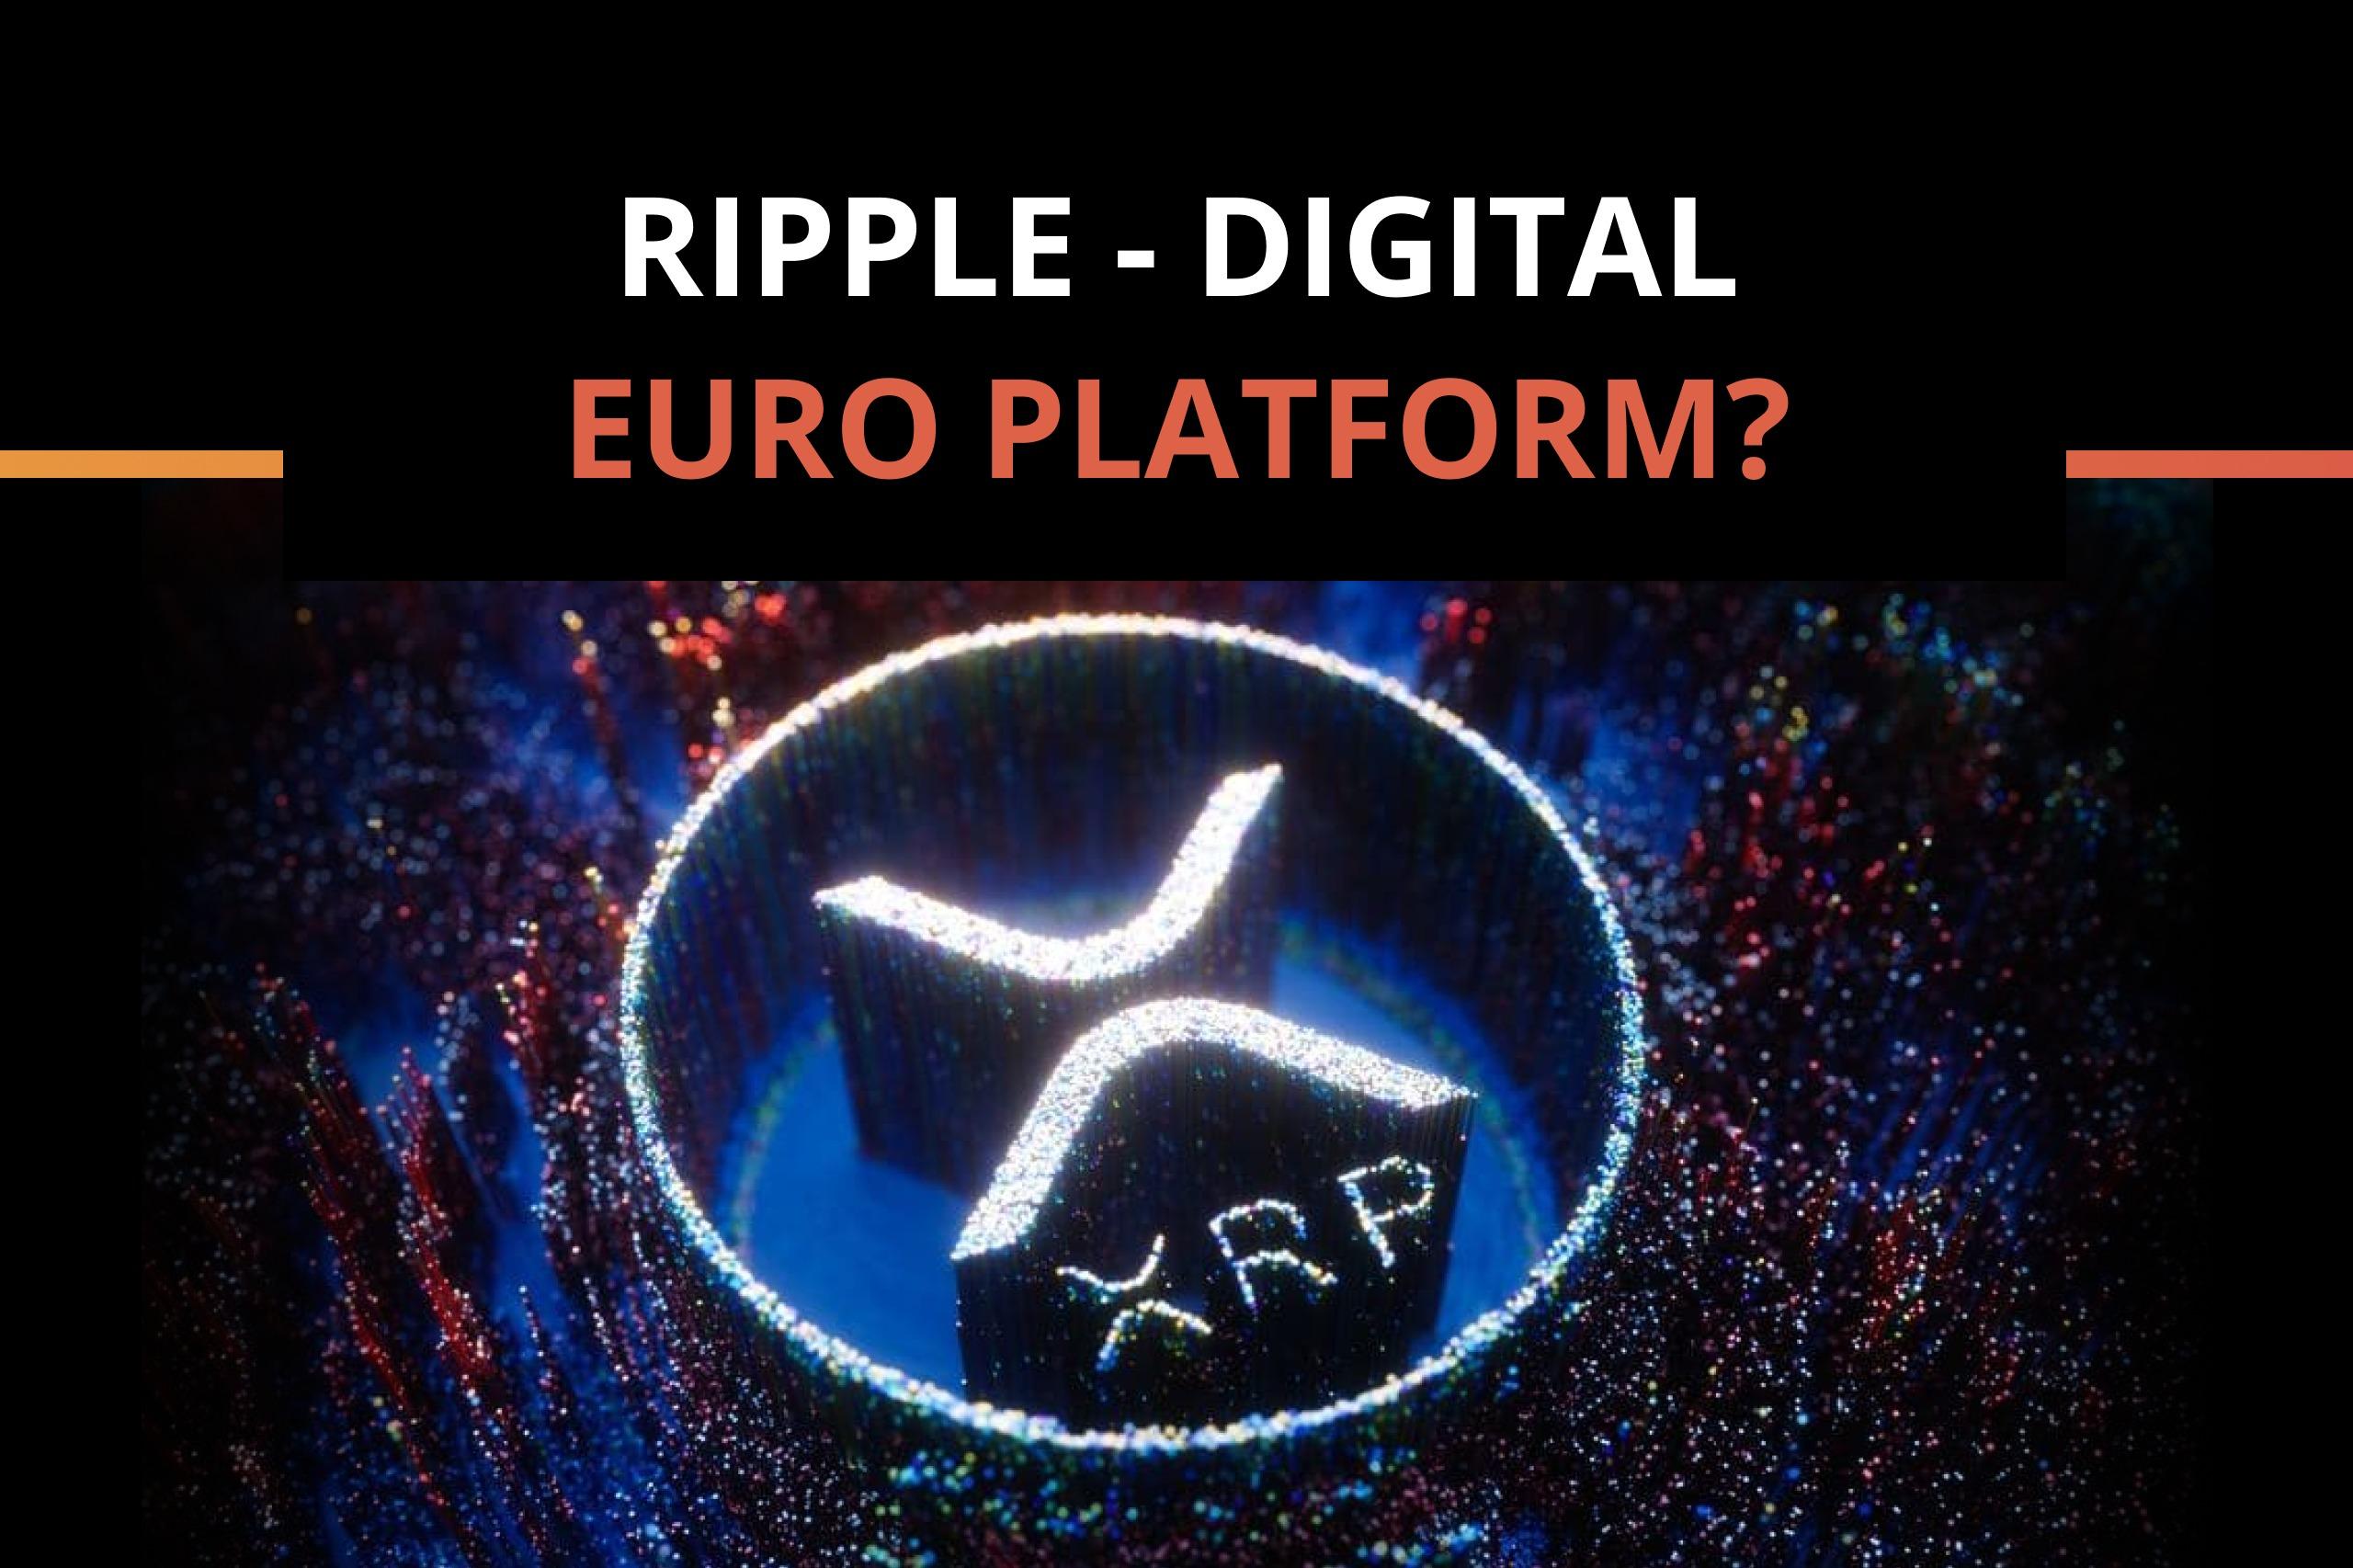 Ripple as a digital EURO platform?